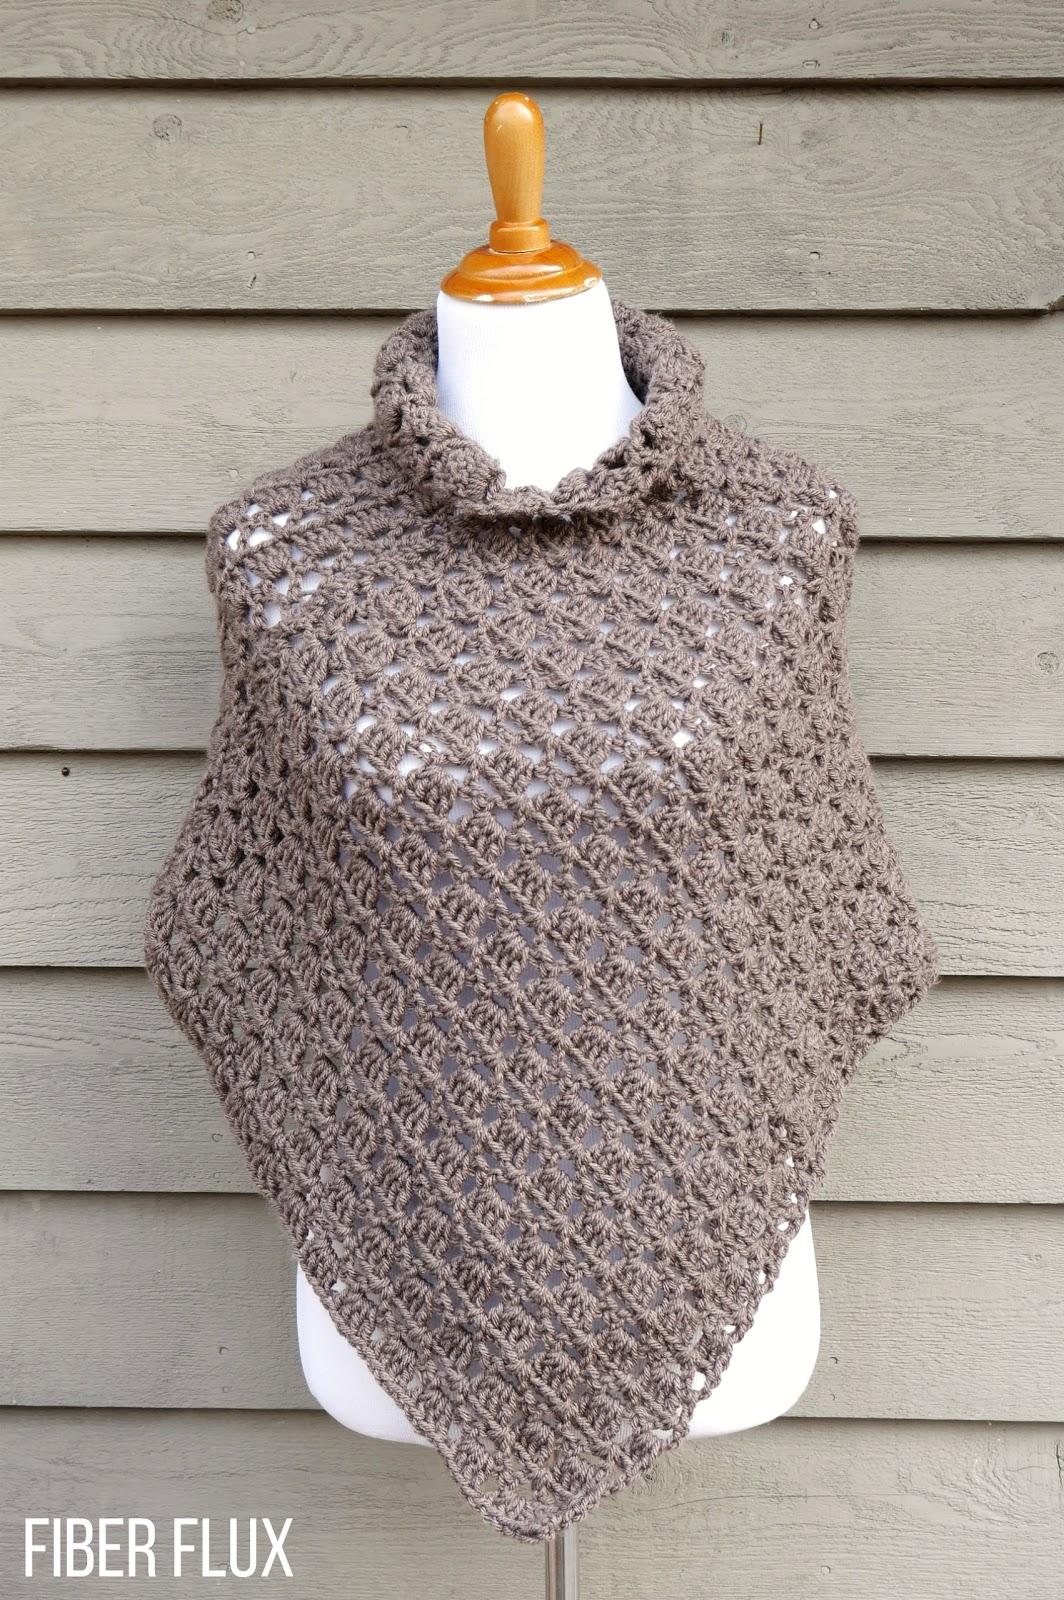 Fiber Flux Free Crochet Patternwoodland Splendor Poncho